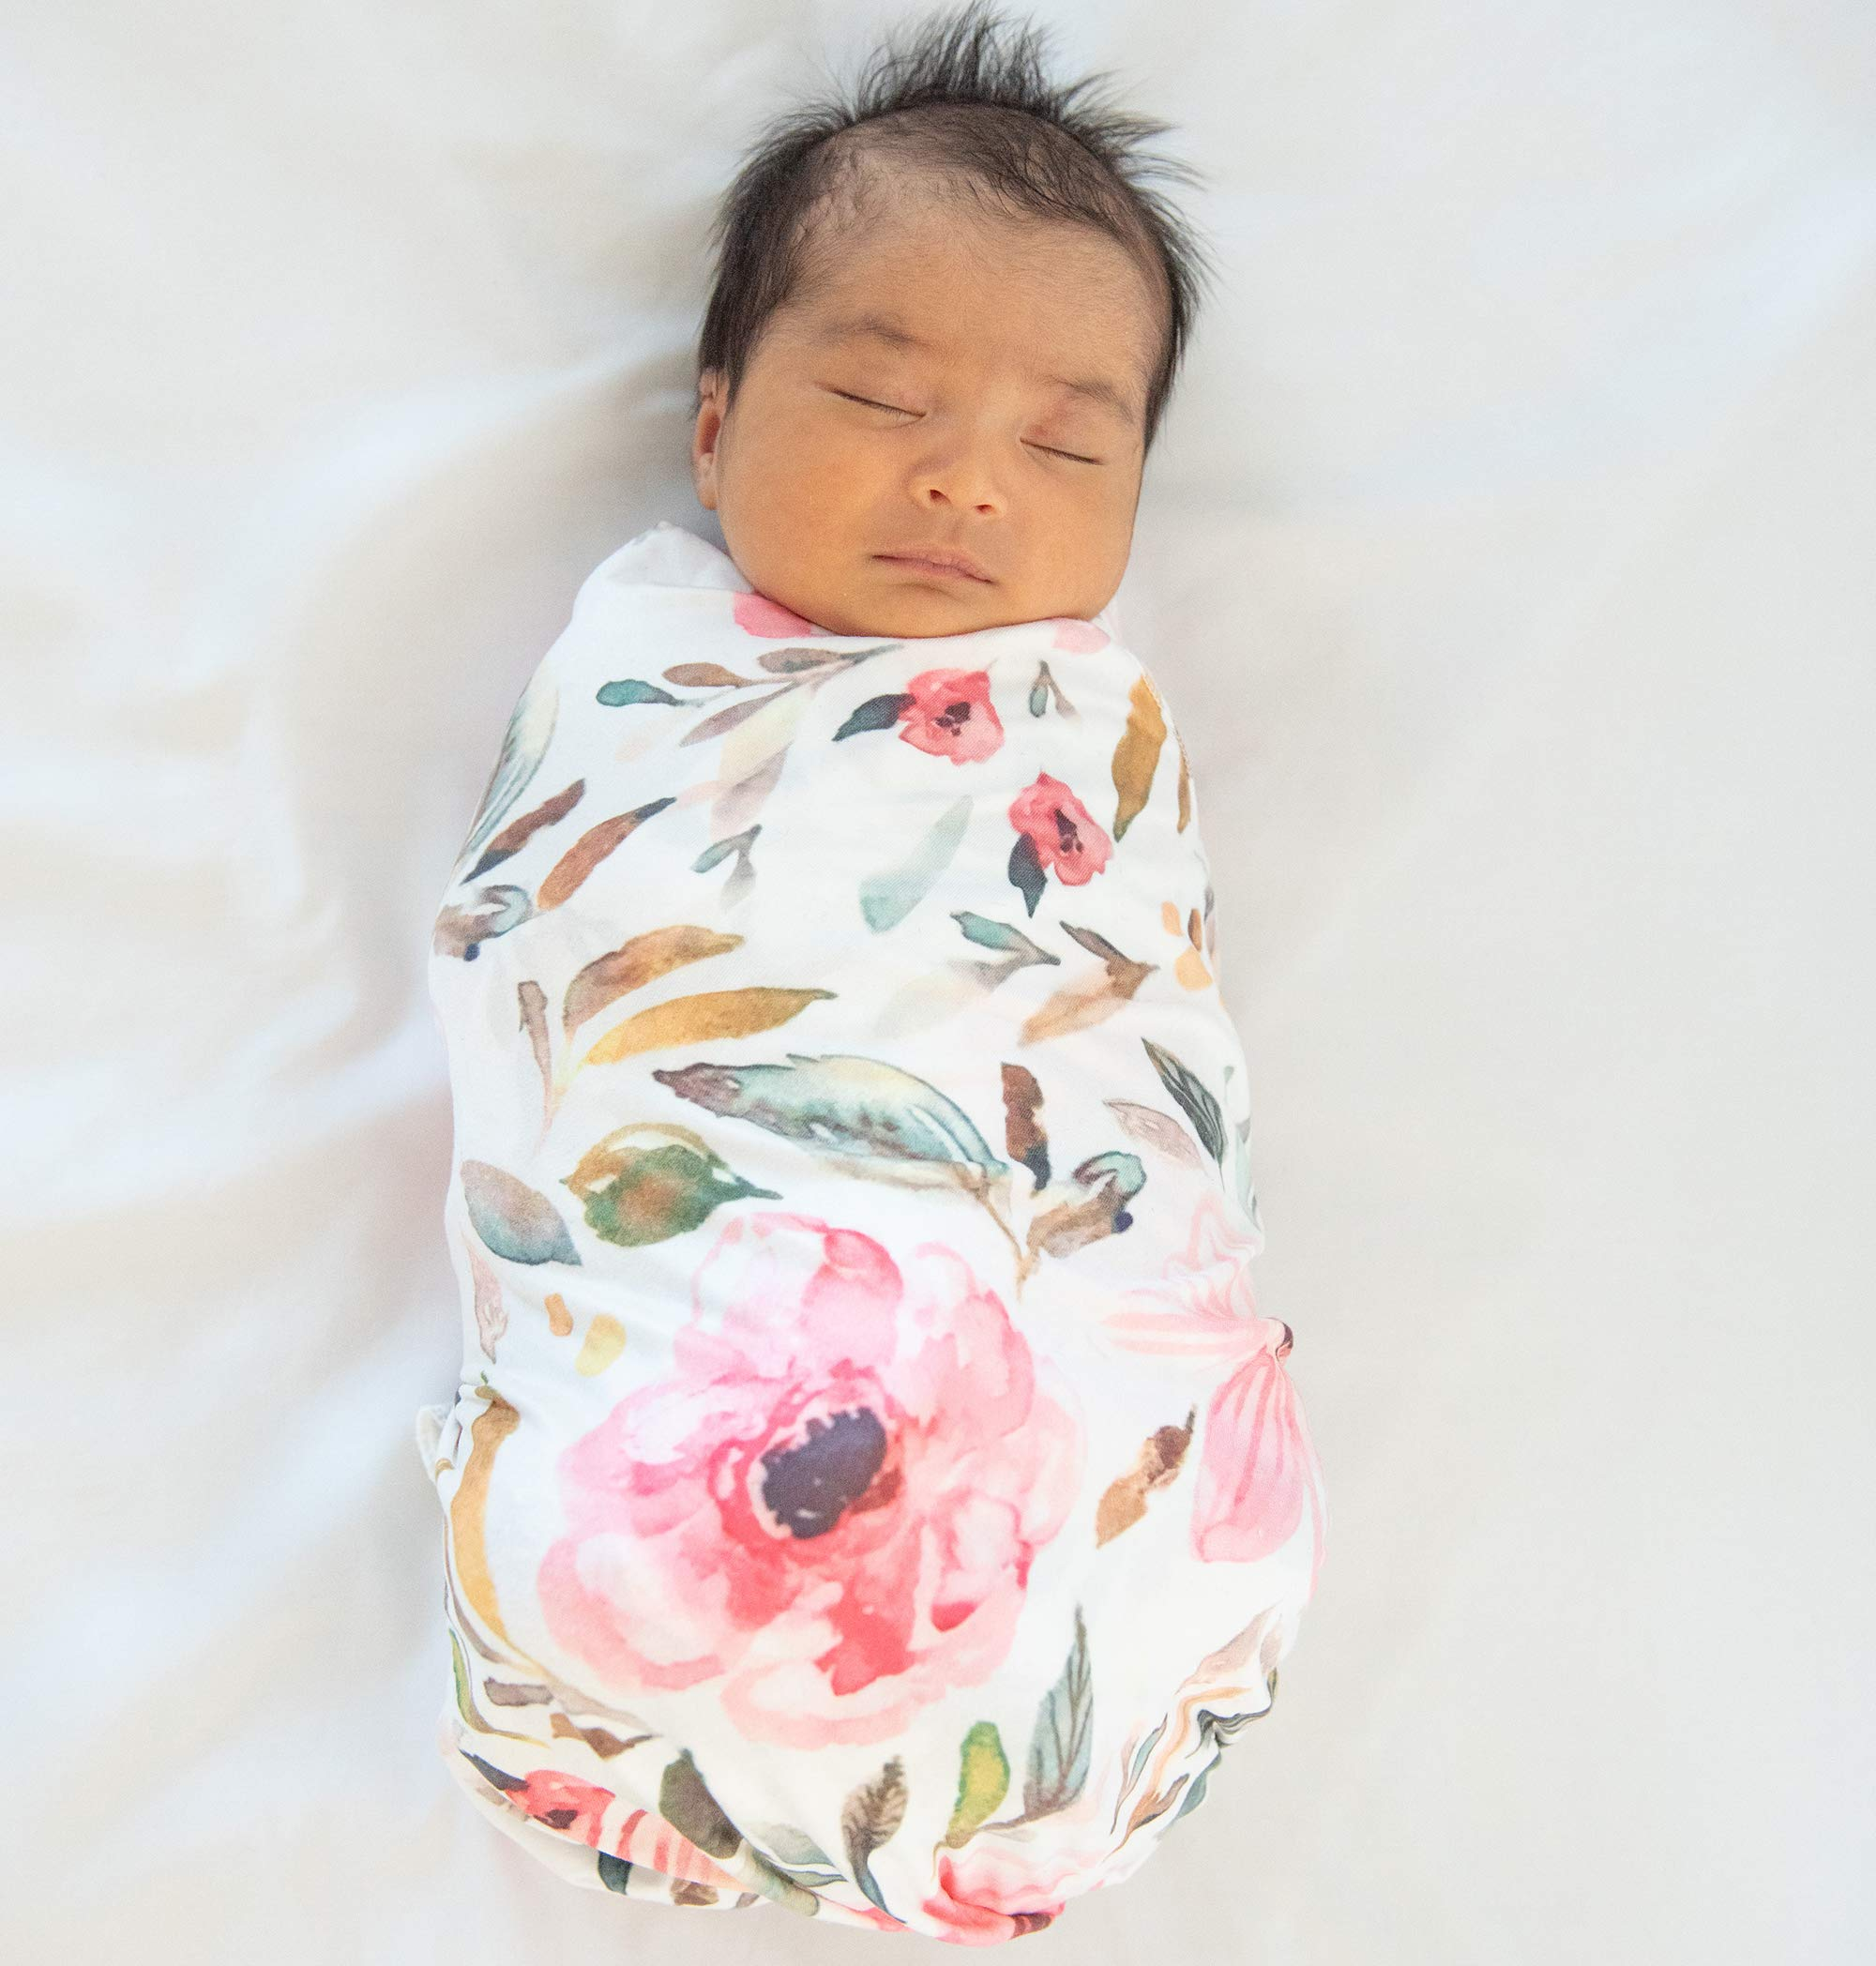 swaddle blanketmustard floral swaddle blanketnewborn baby swaddle blanket